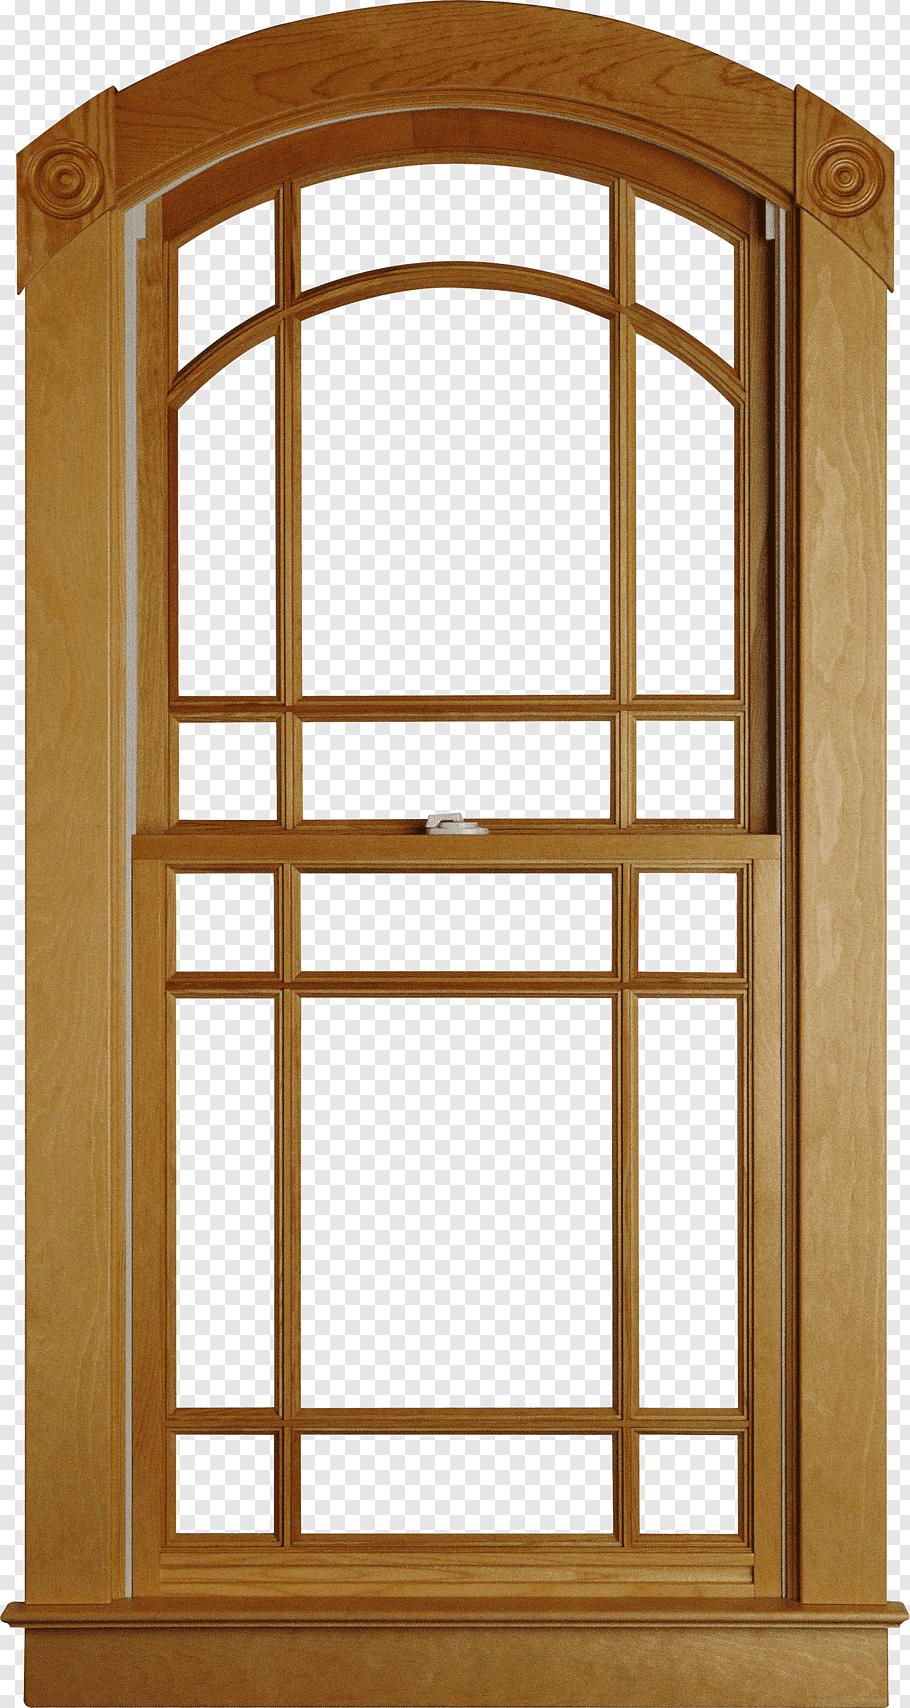 Brown Wooden Window Frame Illustration Window Interior Design Services House Home Wood Window Fre Wooden Window Frames Windows And Doors Wooden Window Design